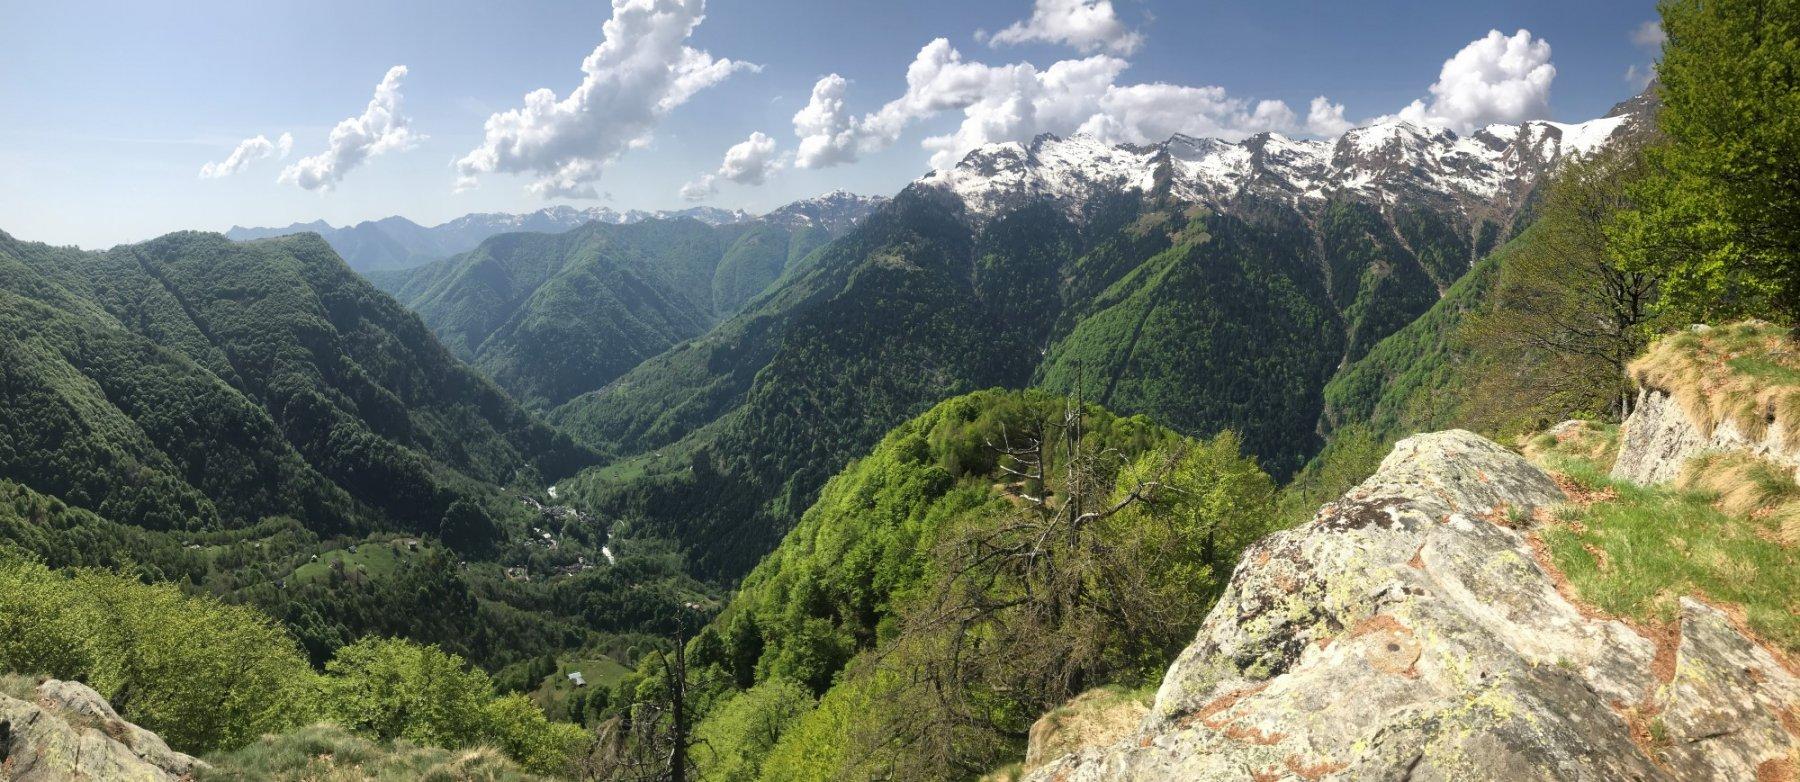 Vista dall'Alpe Le Teste